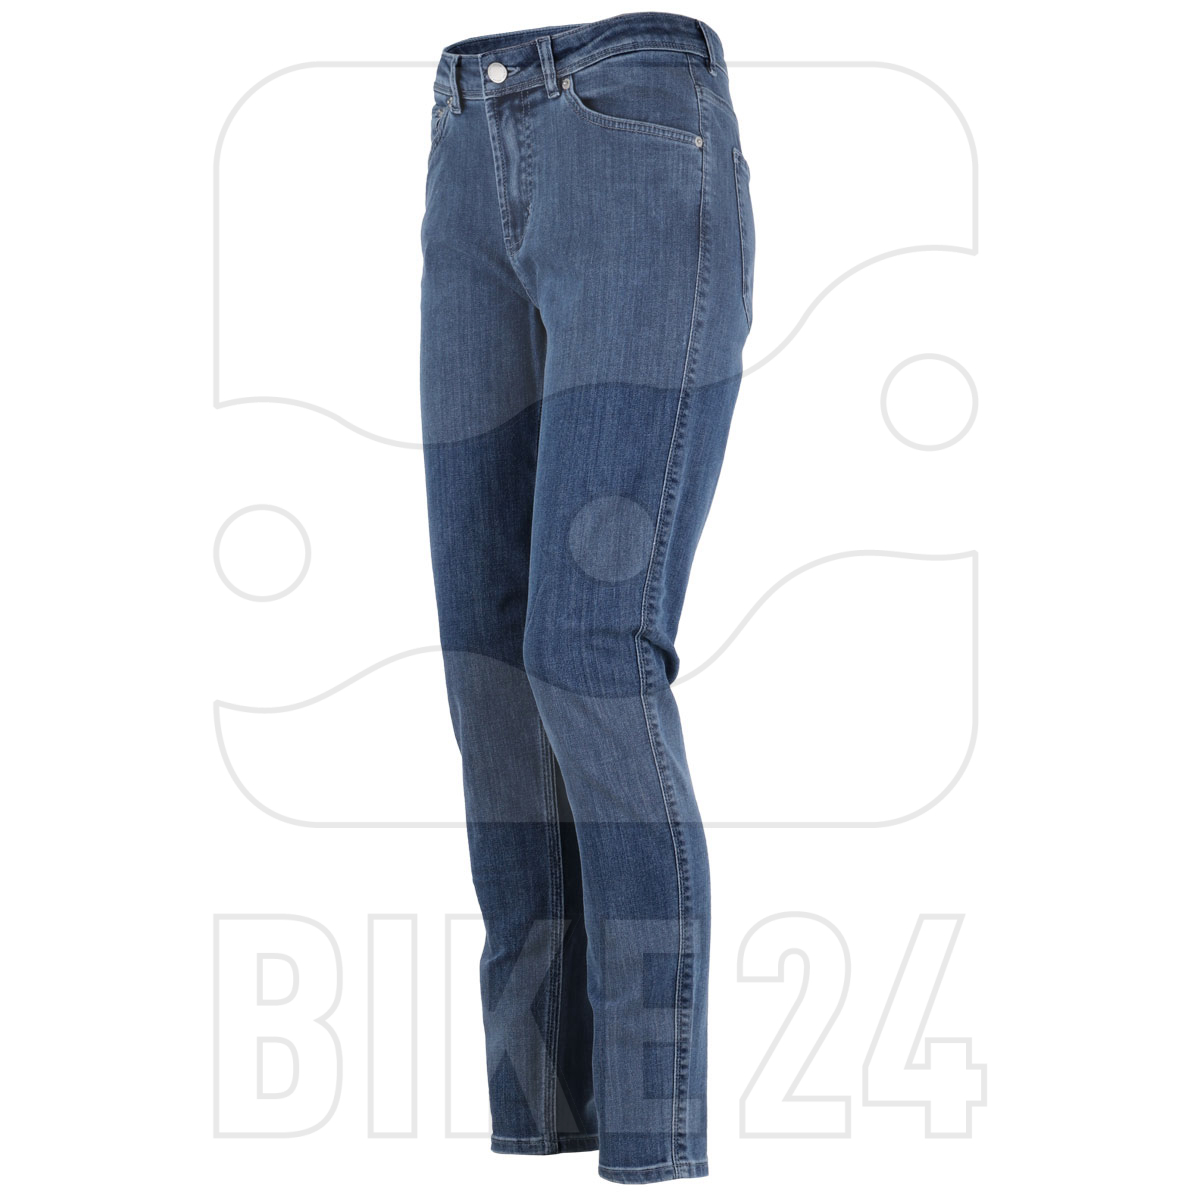 DUER Performance Denim Women Jeans Pants Skinny - L31 - Indigo 25